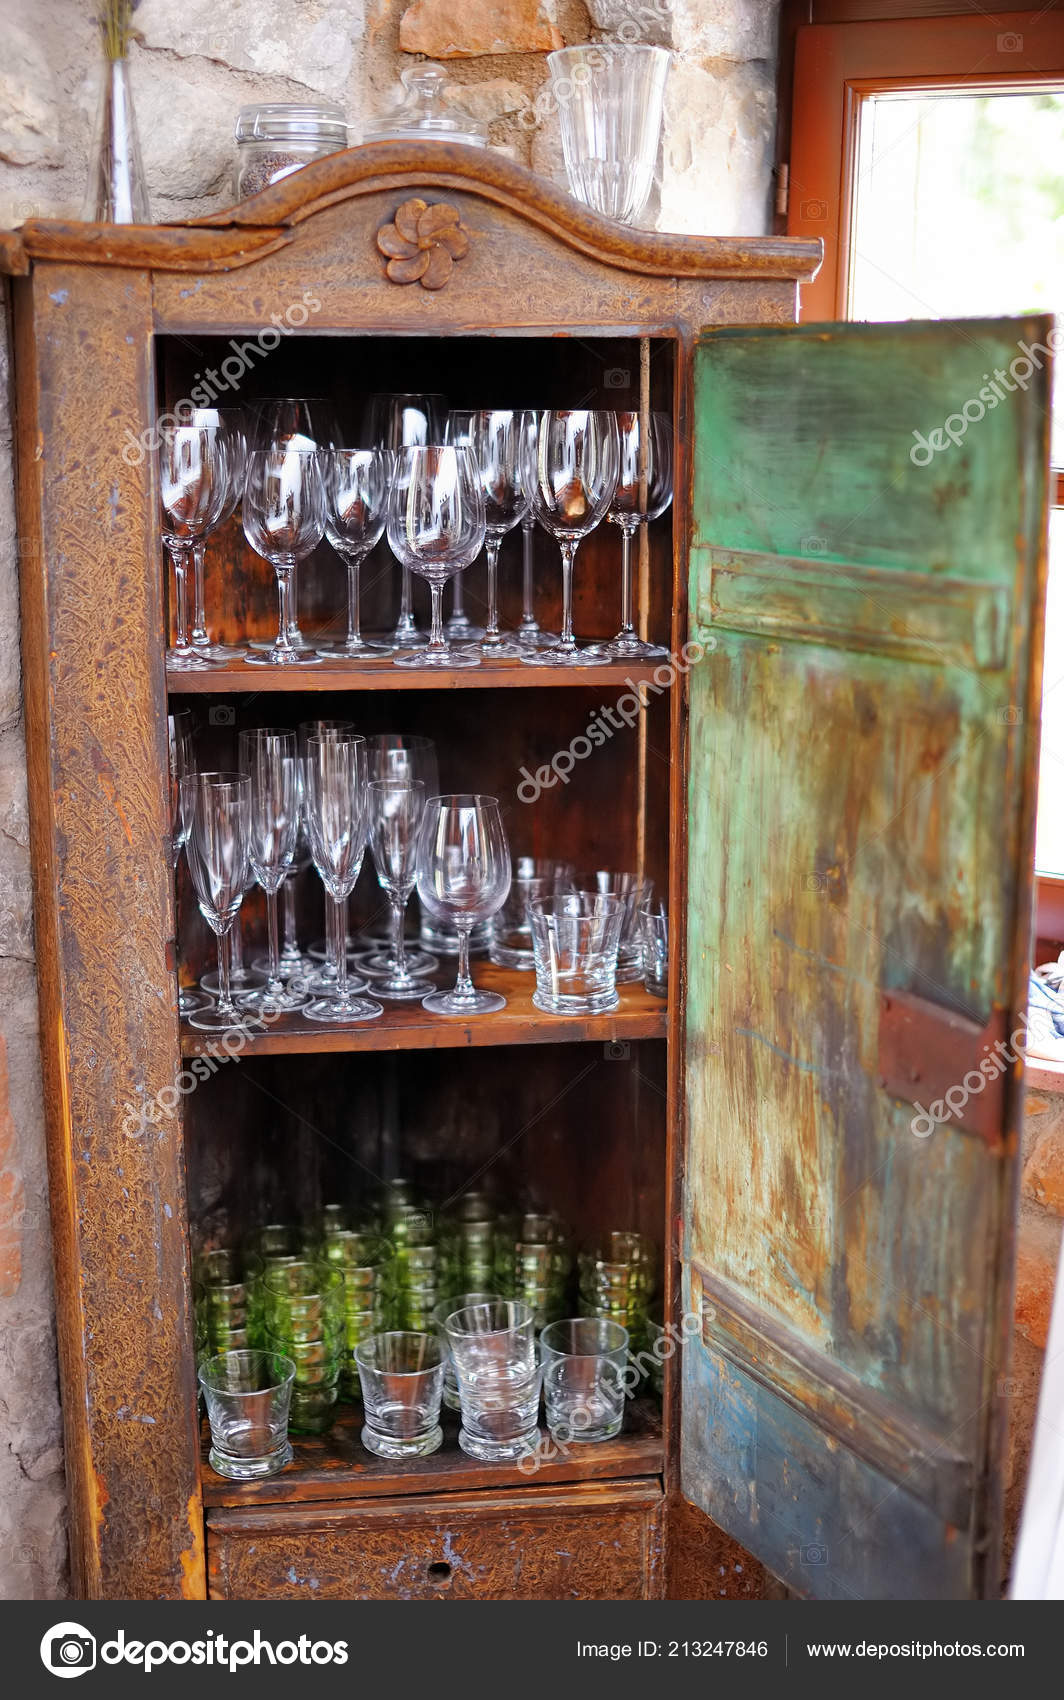 kitchen wood cabinets where to buy curtains 旧式乡村式木柜配套玻璃器皿及厨房设备 图库照片 c maximkabb 213247846